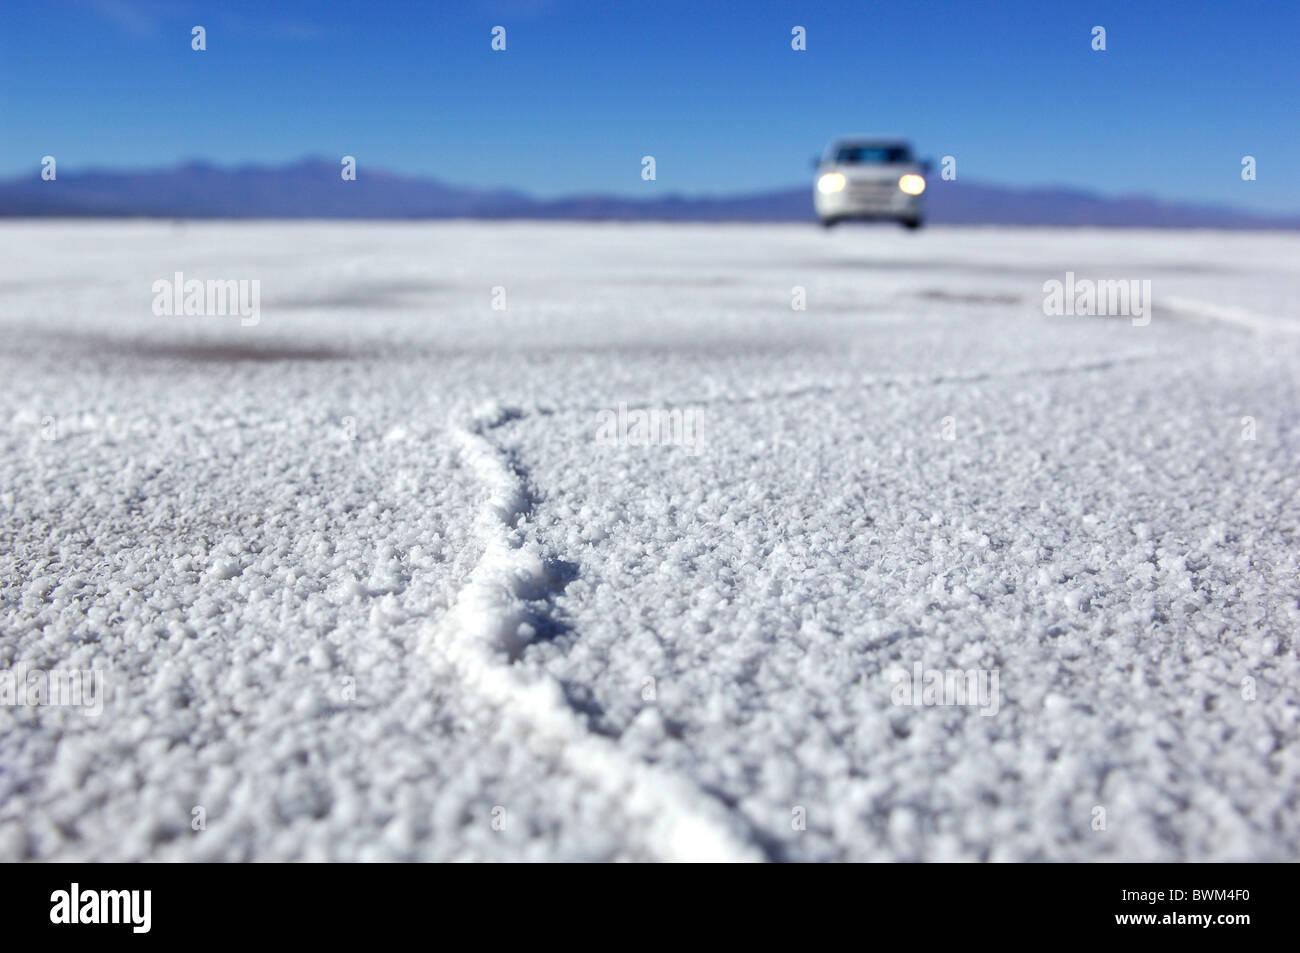 Argentina South America Salinas Grandes Near Tres Morros Salt Flats